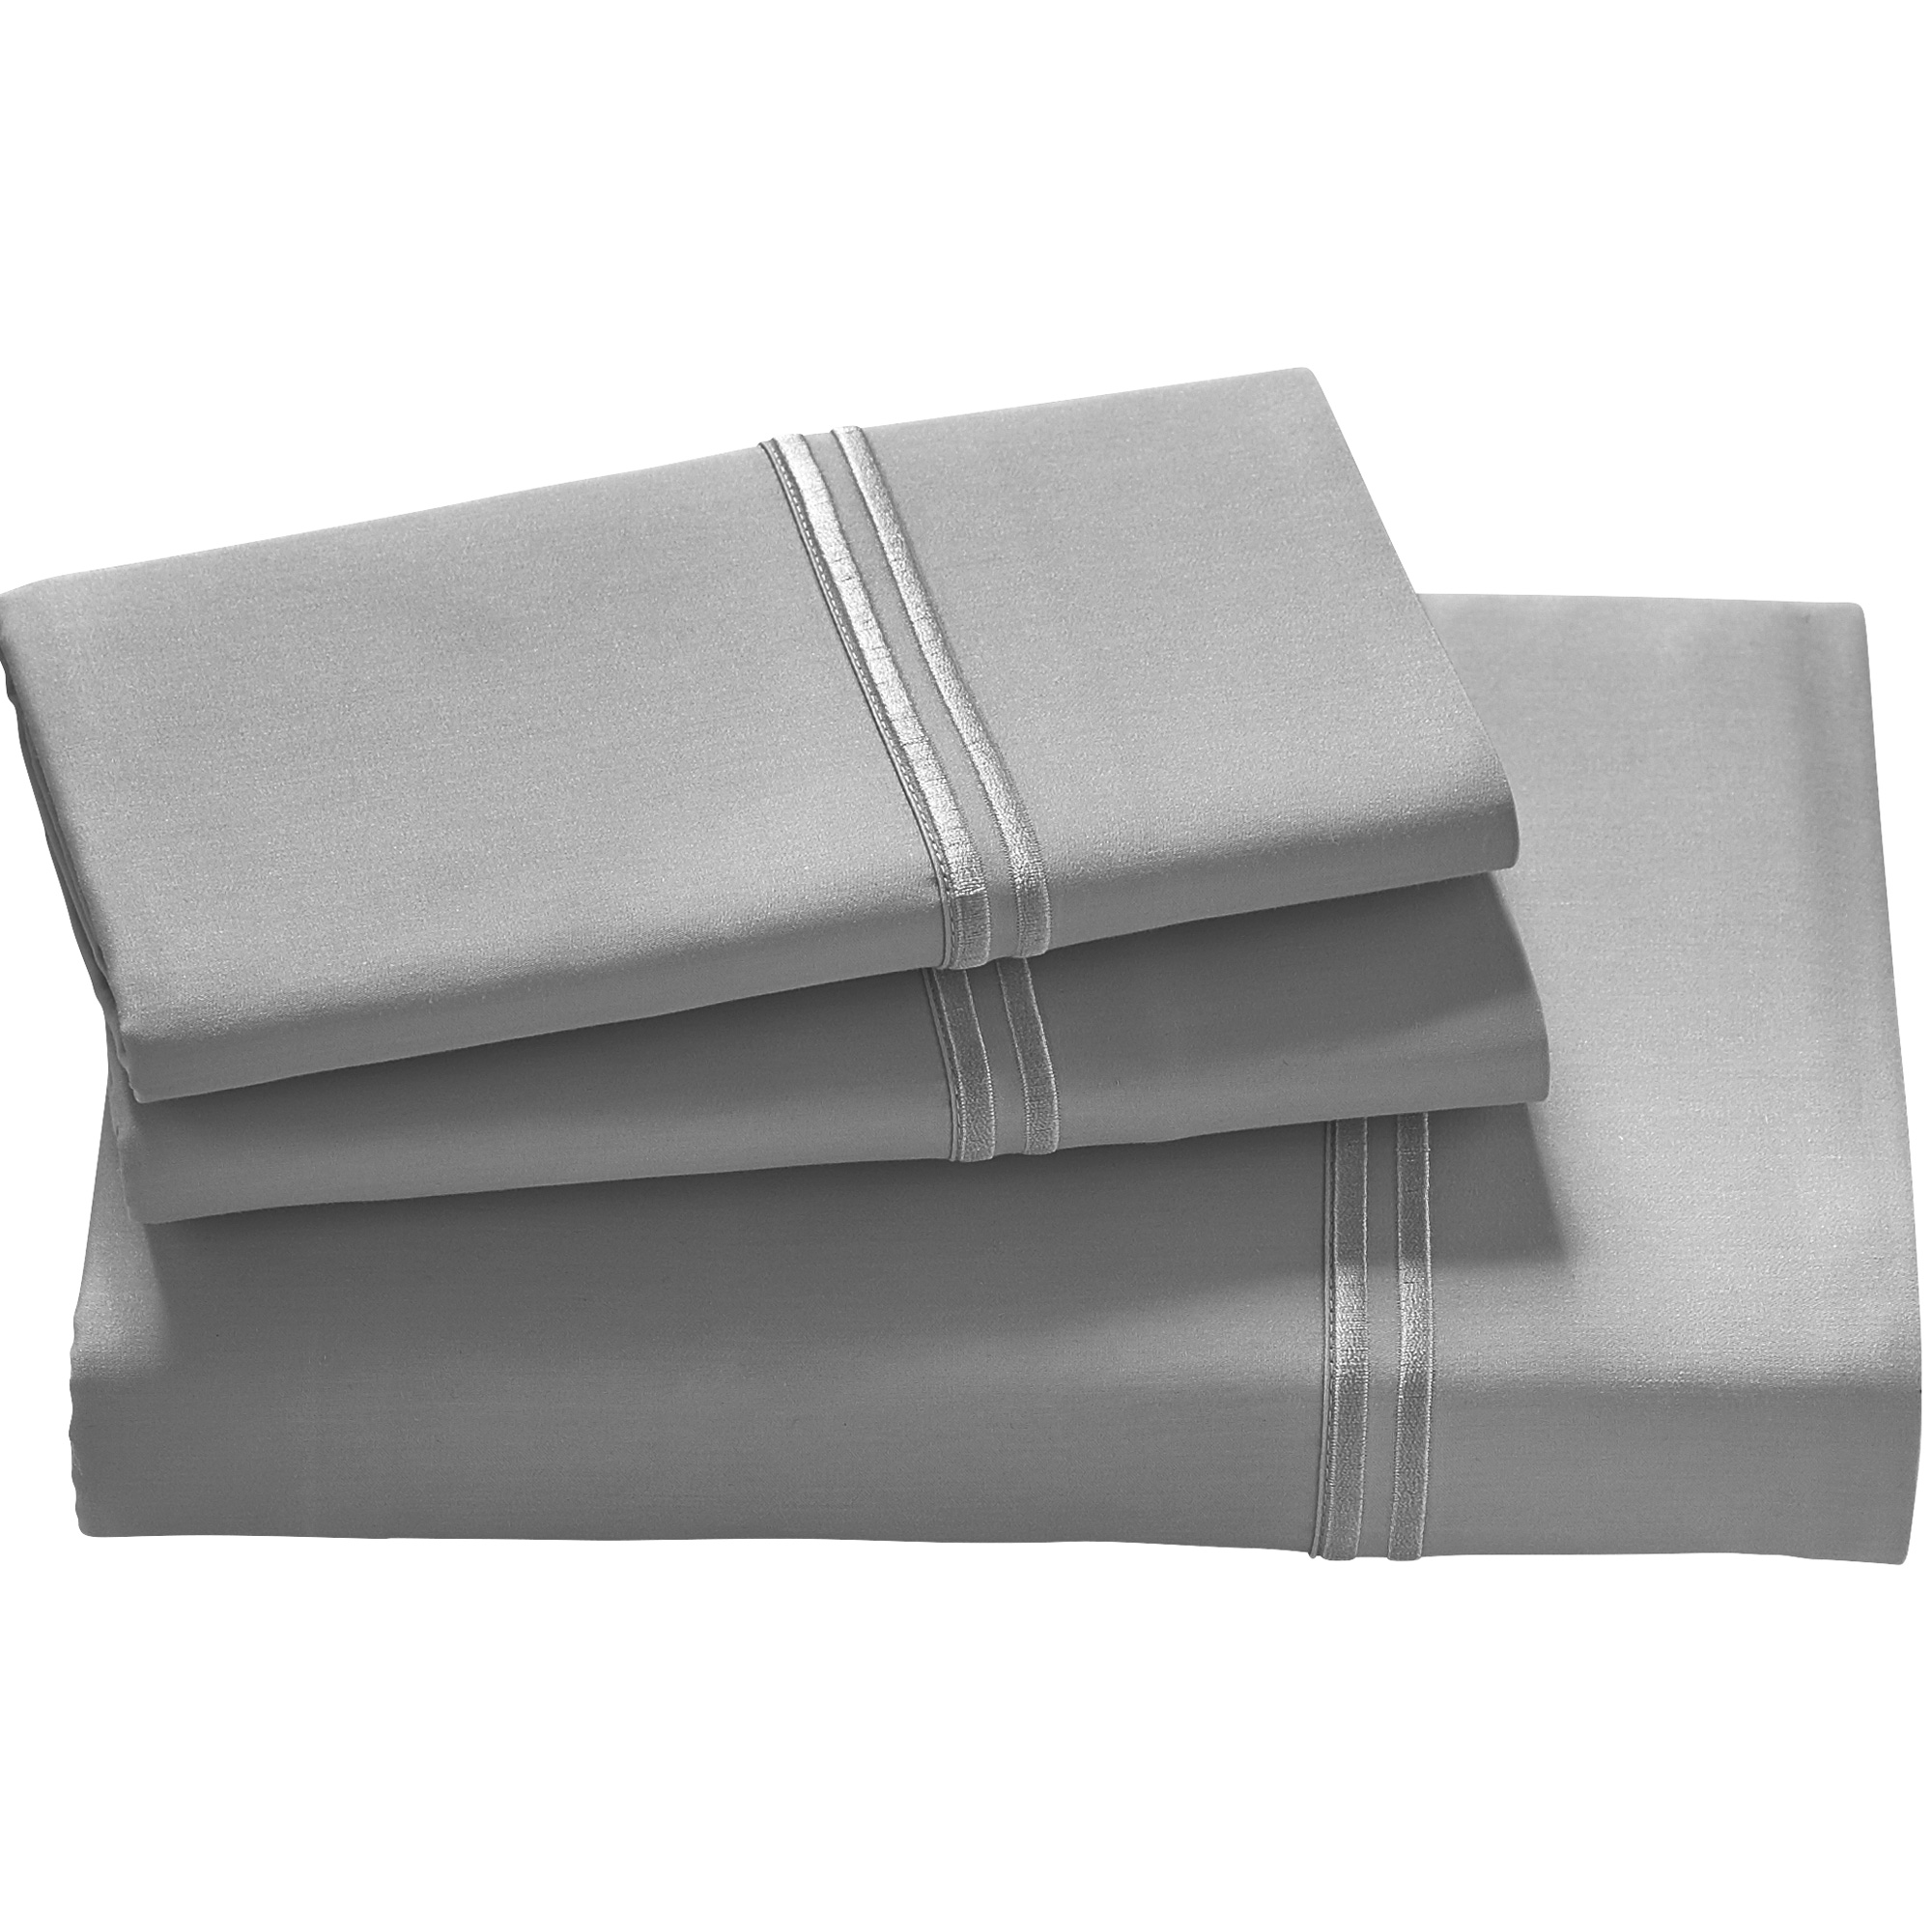 Purecare | Elements Dove Gray California King Tencel Sheet Set